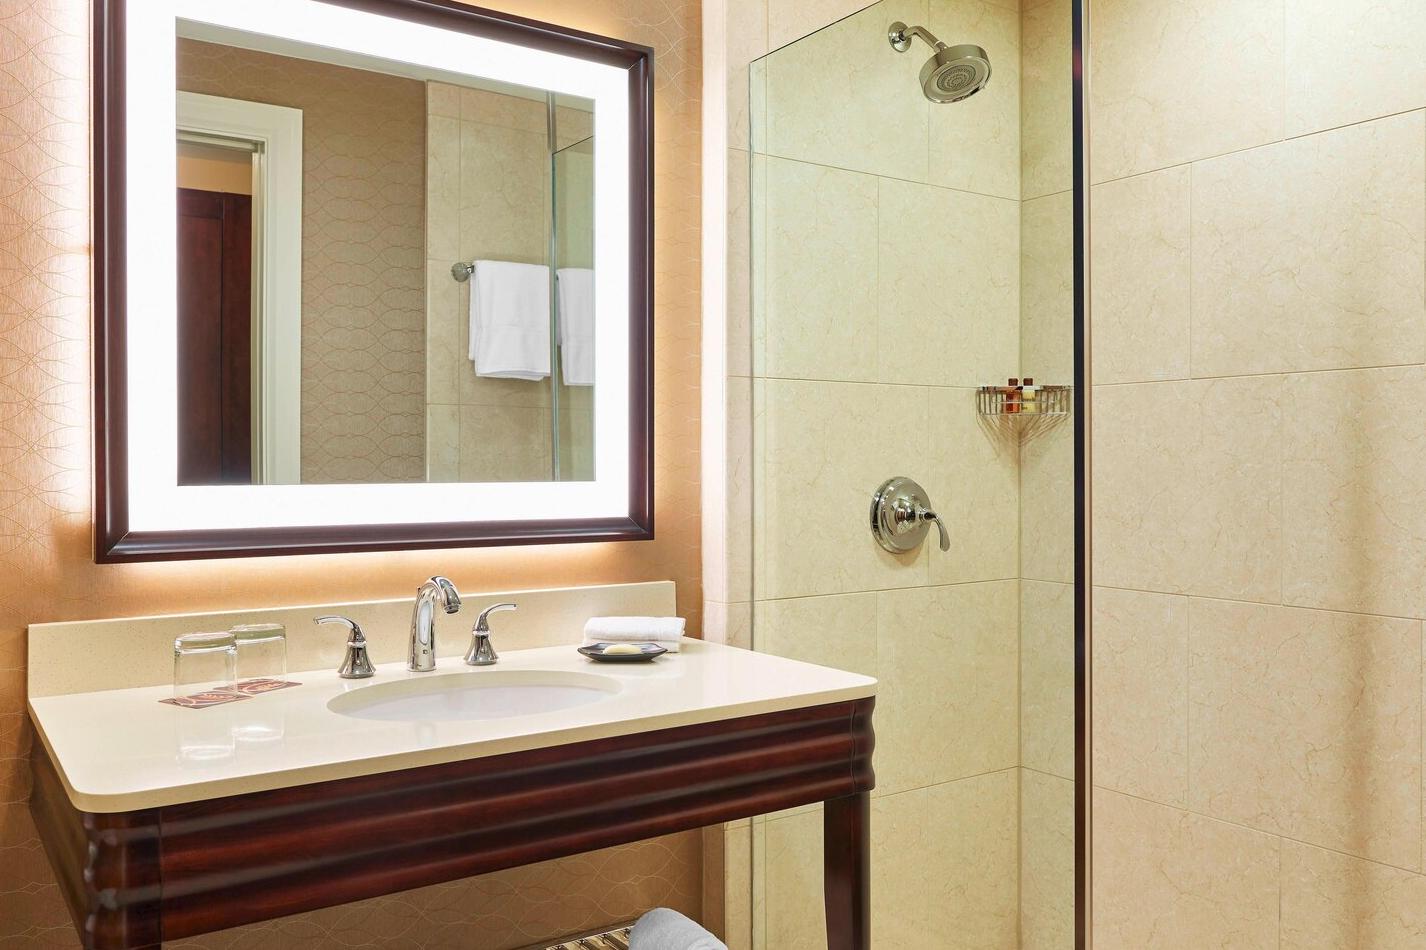 https://www.hotelsbyday.com/_data/default-hotel_image/3/16444/screenshot-2020-04-07-at-4-17-34-pm.png